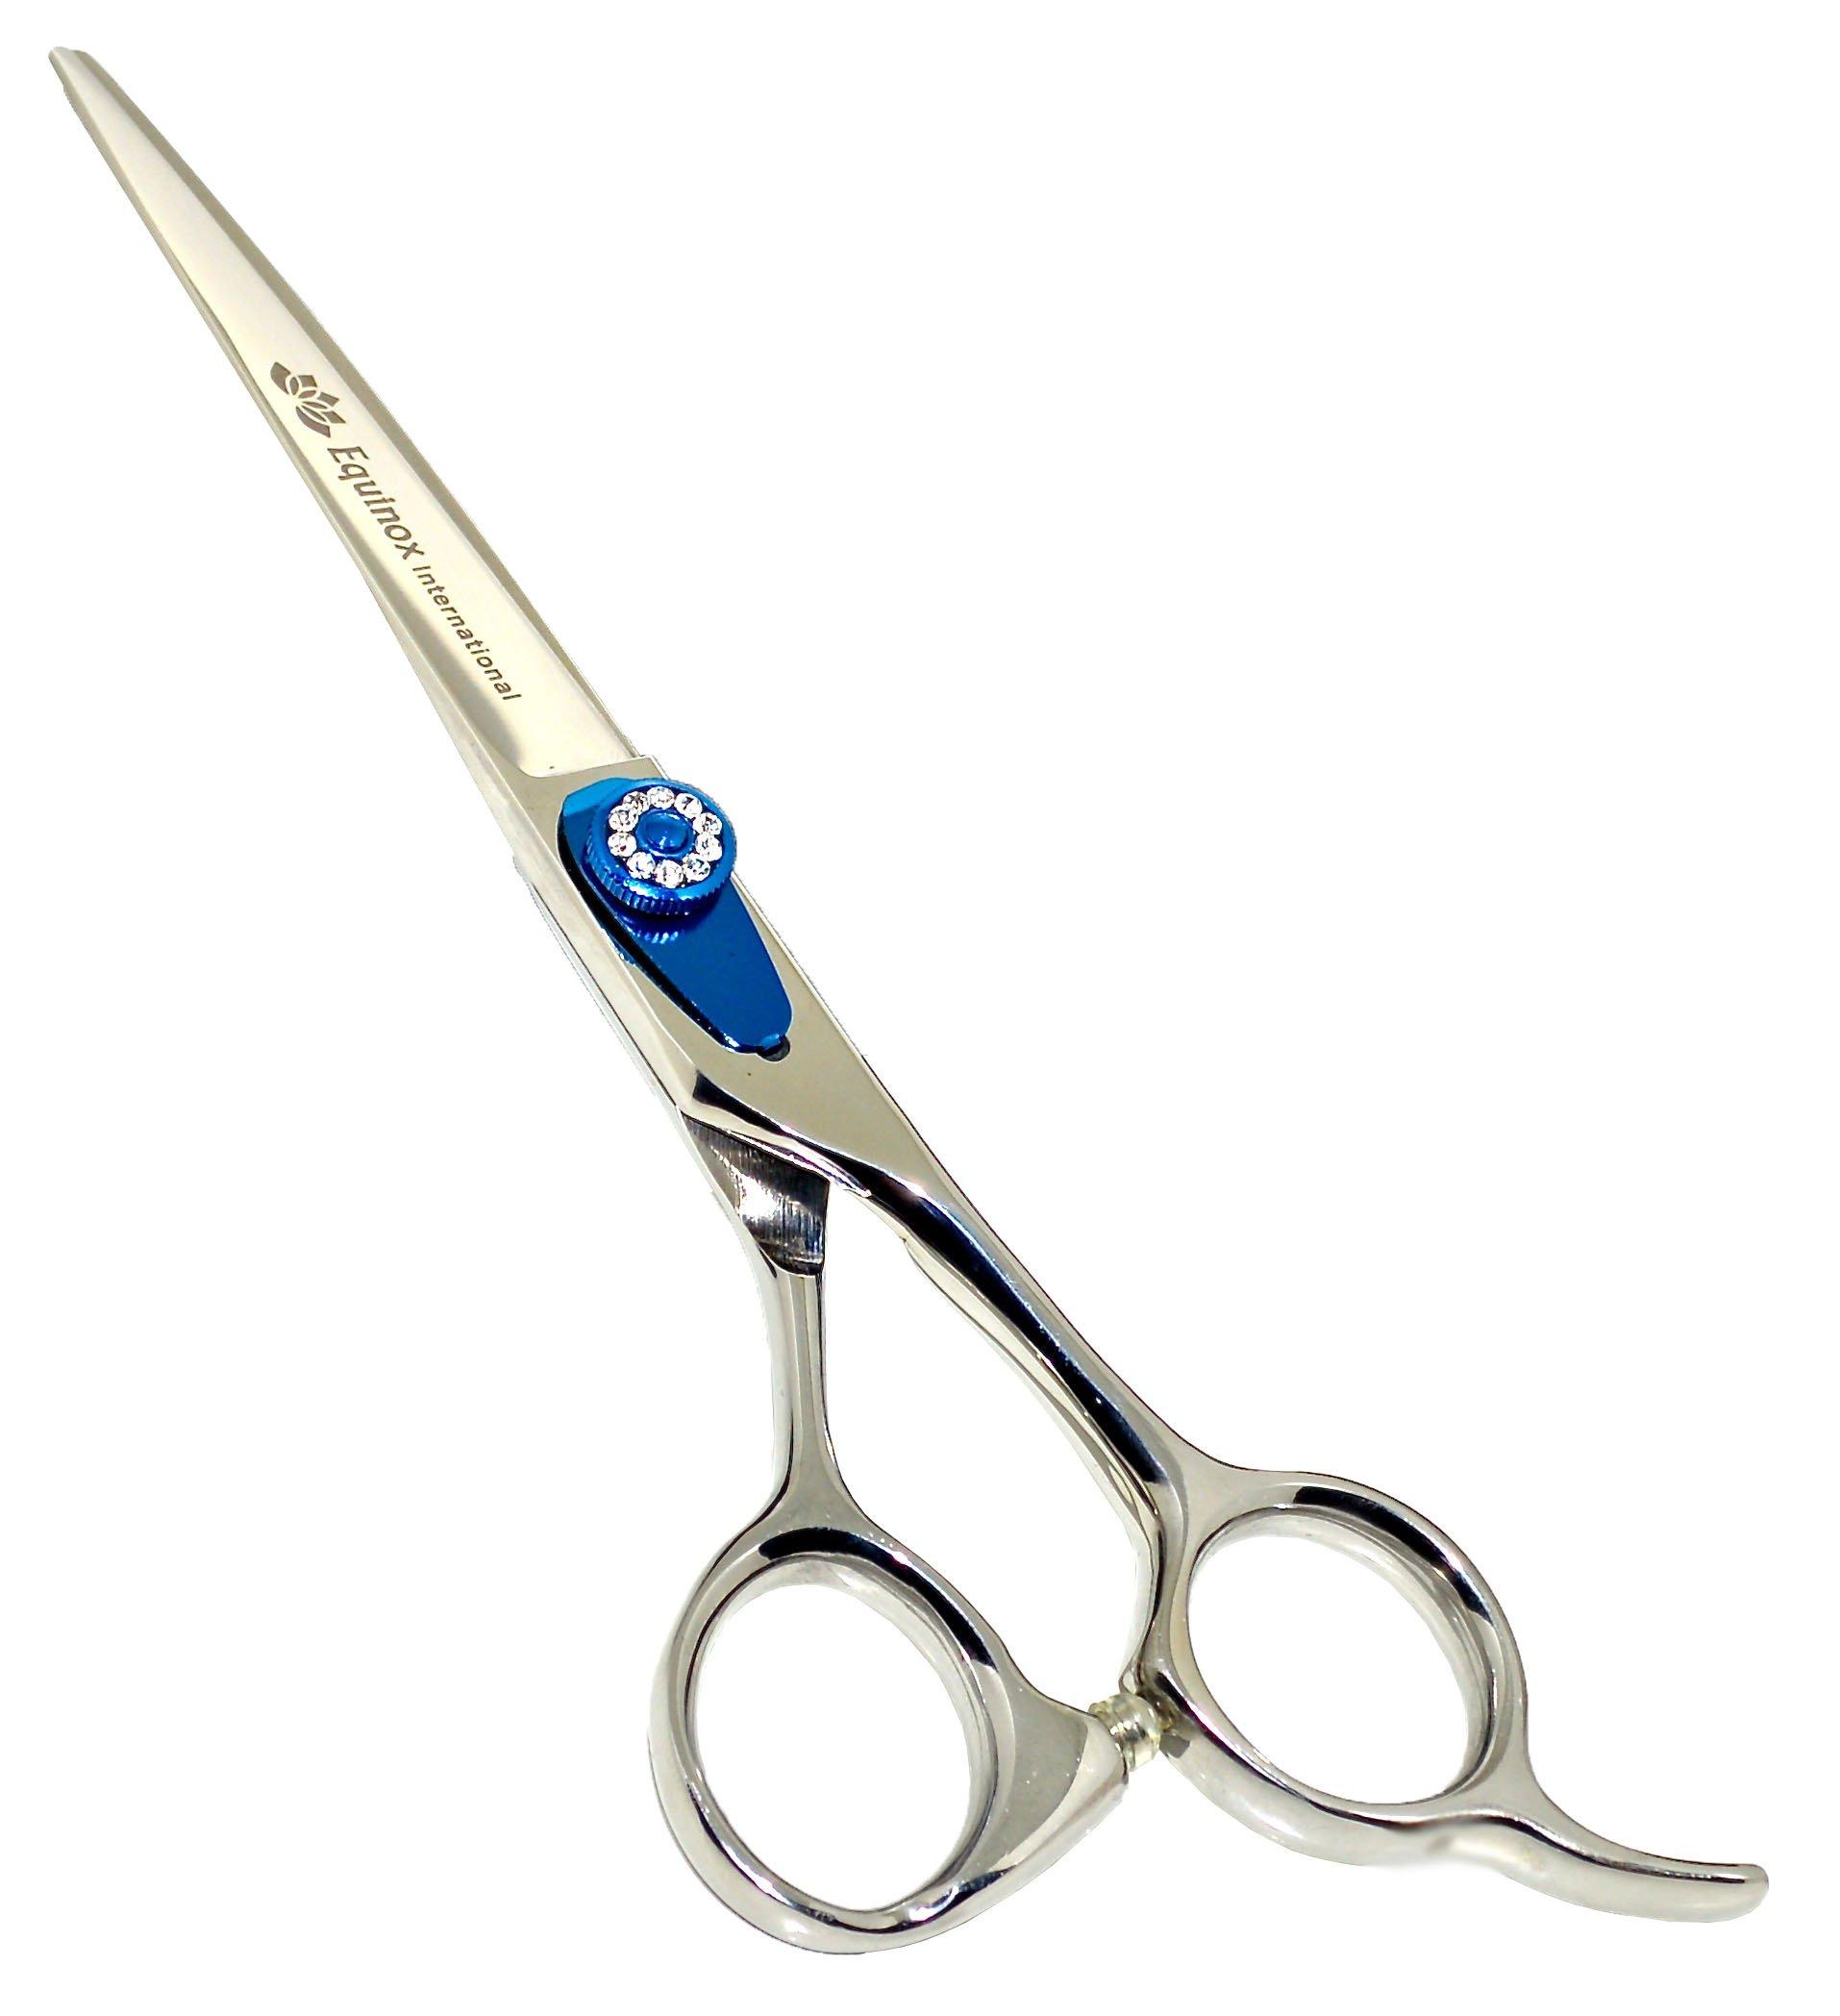 Equinox Professional Razor Edge Series - Barber Hair Cutting Scissors/Shears - 6.5'' Overall Length - Beautiful White Diamond Stones with Blue Chromium Fine Adjustment Tension Screw by Equinox International (Image #1)